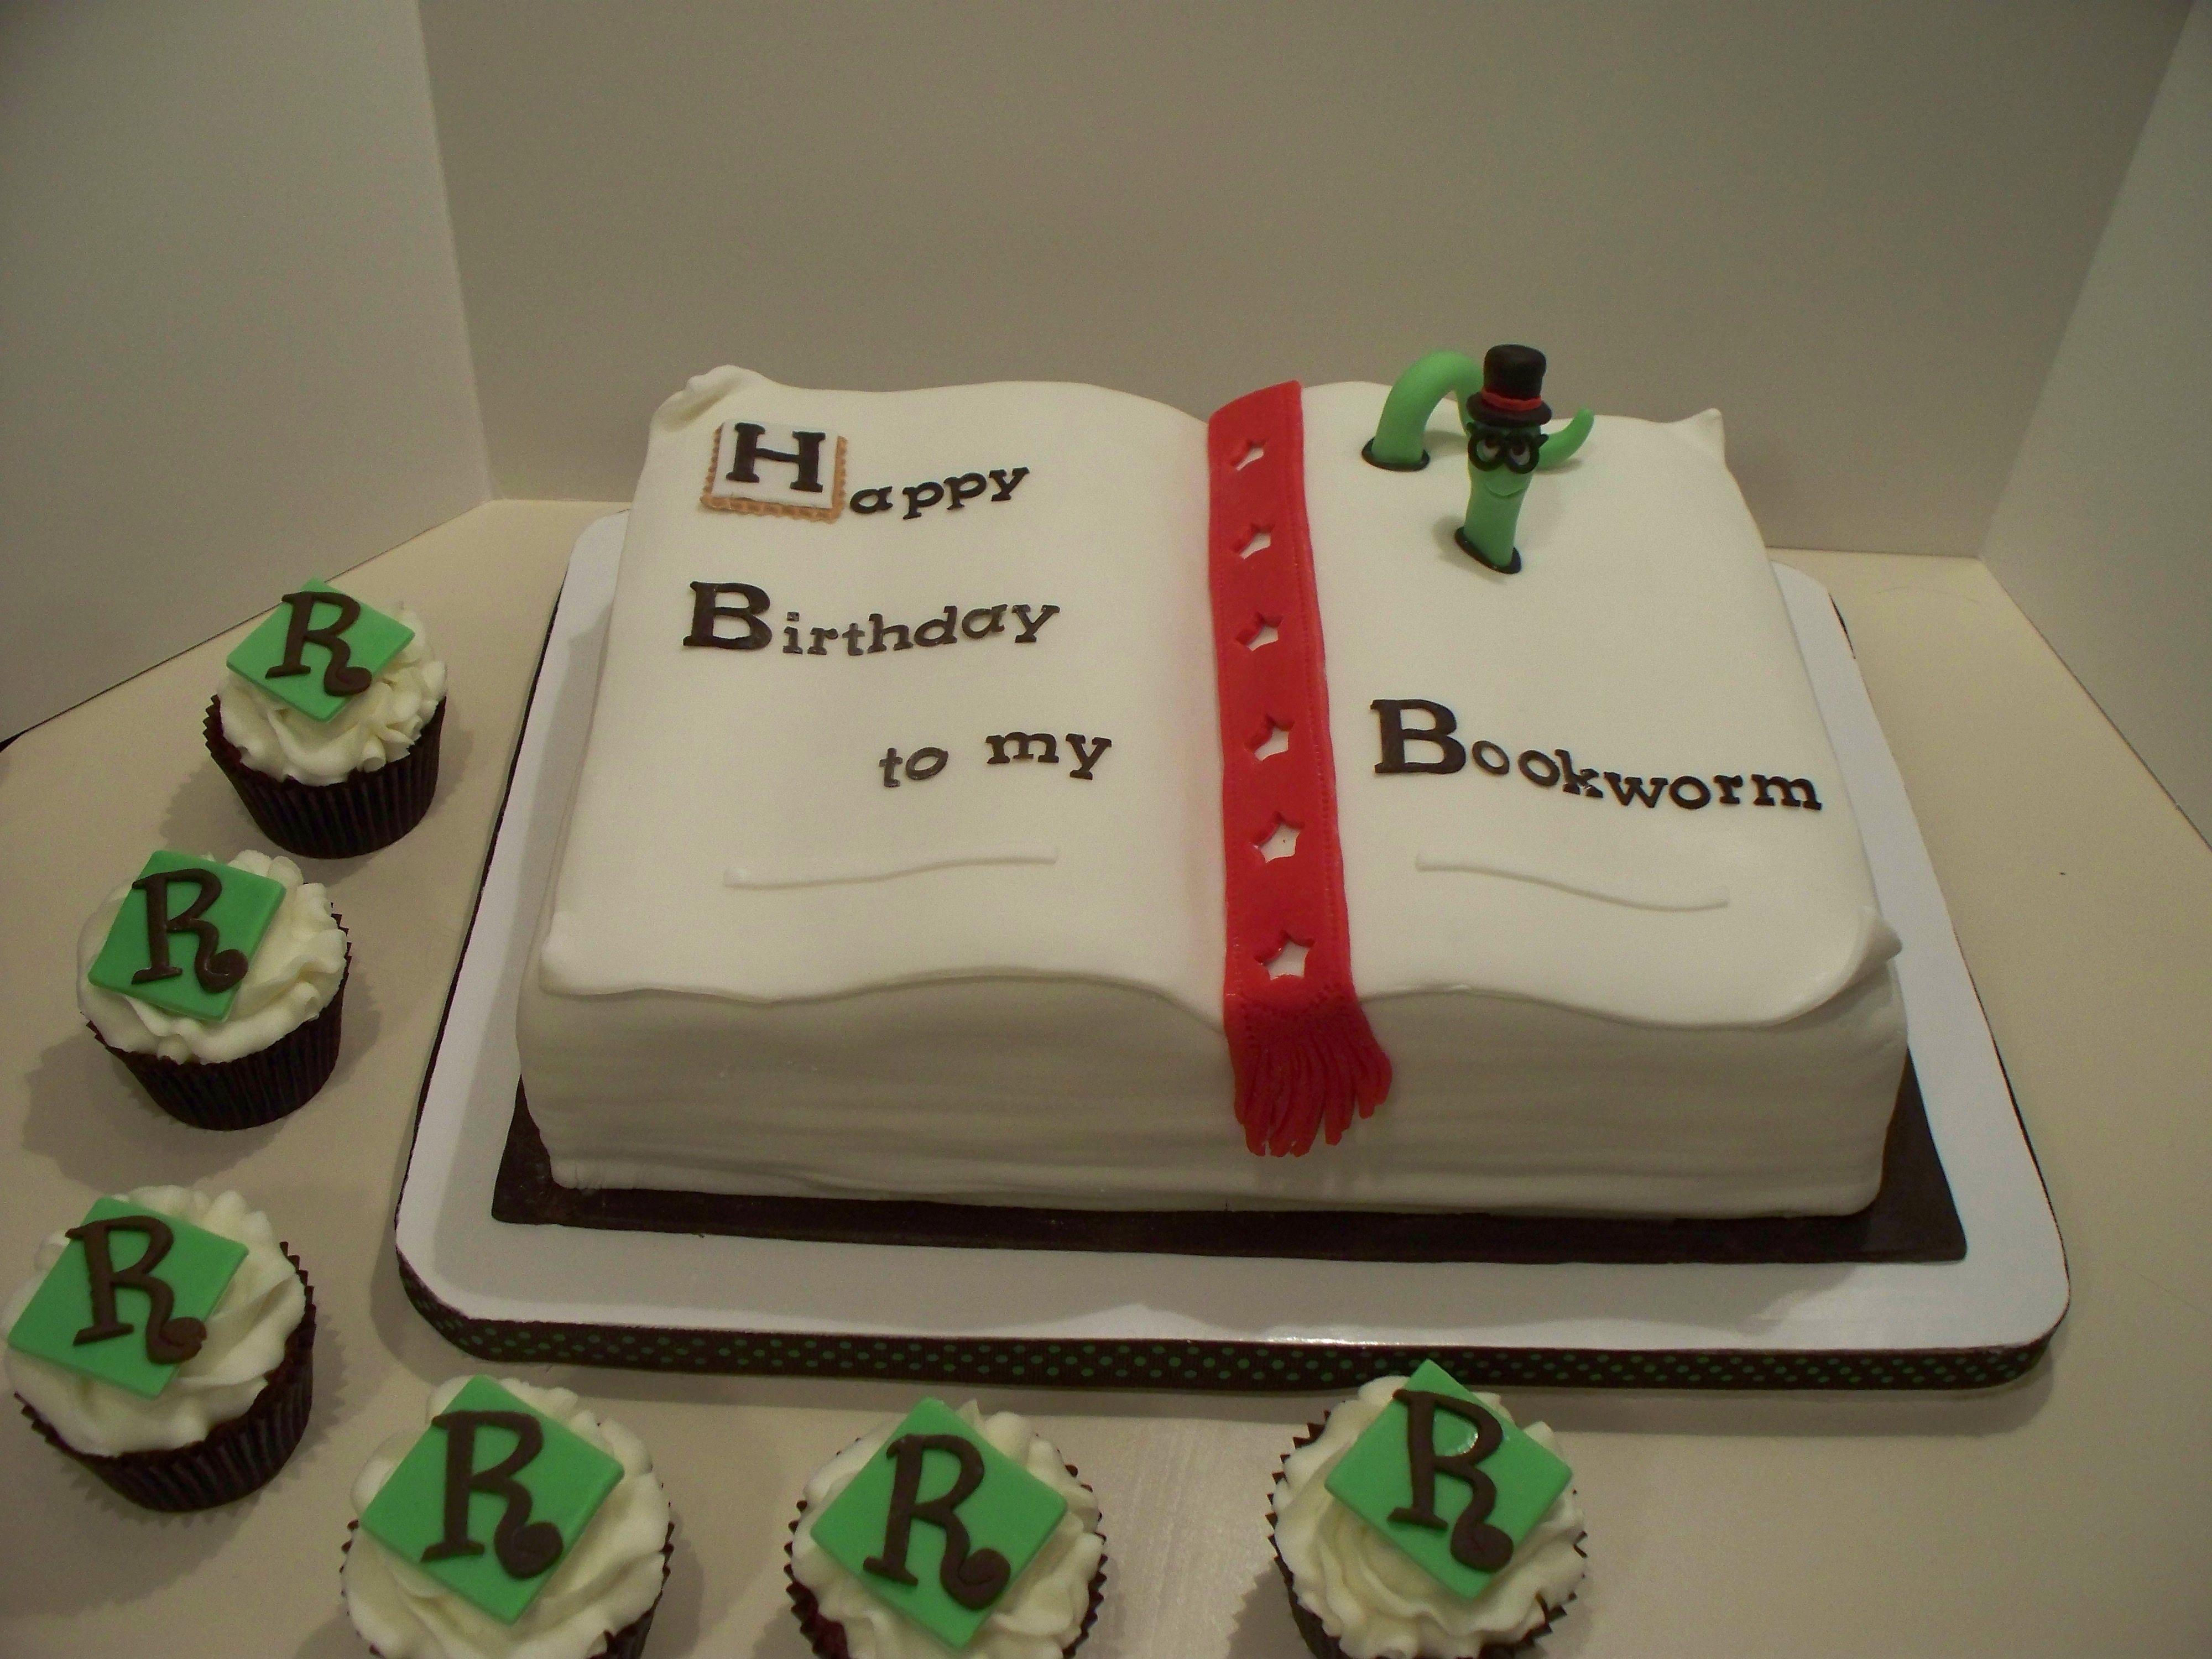 Birthday Bookworm Cake Birthday Cakes Cake Vanilla Cake Birthday